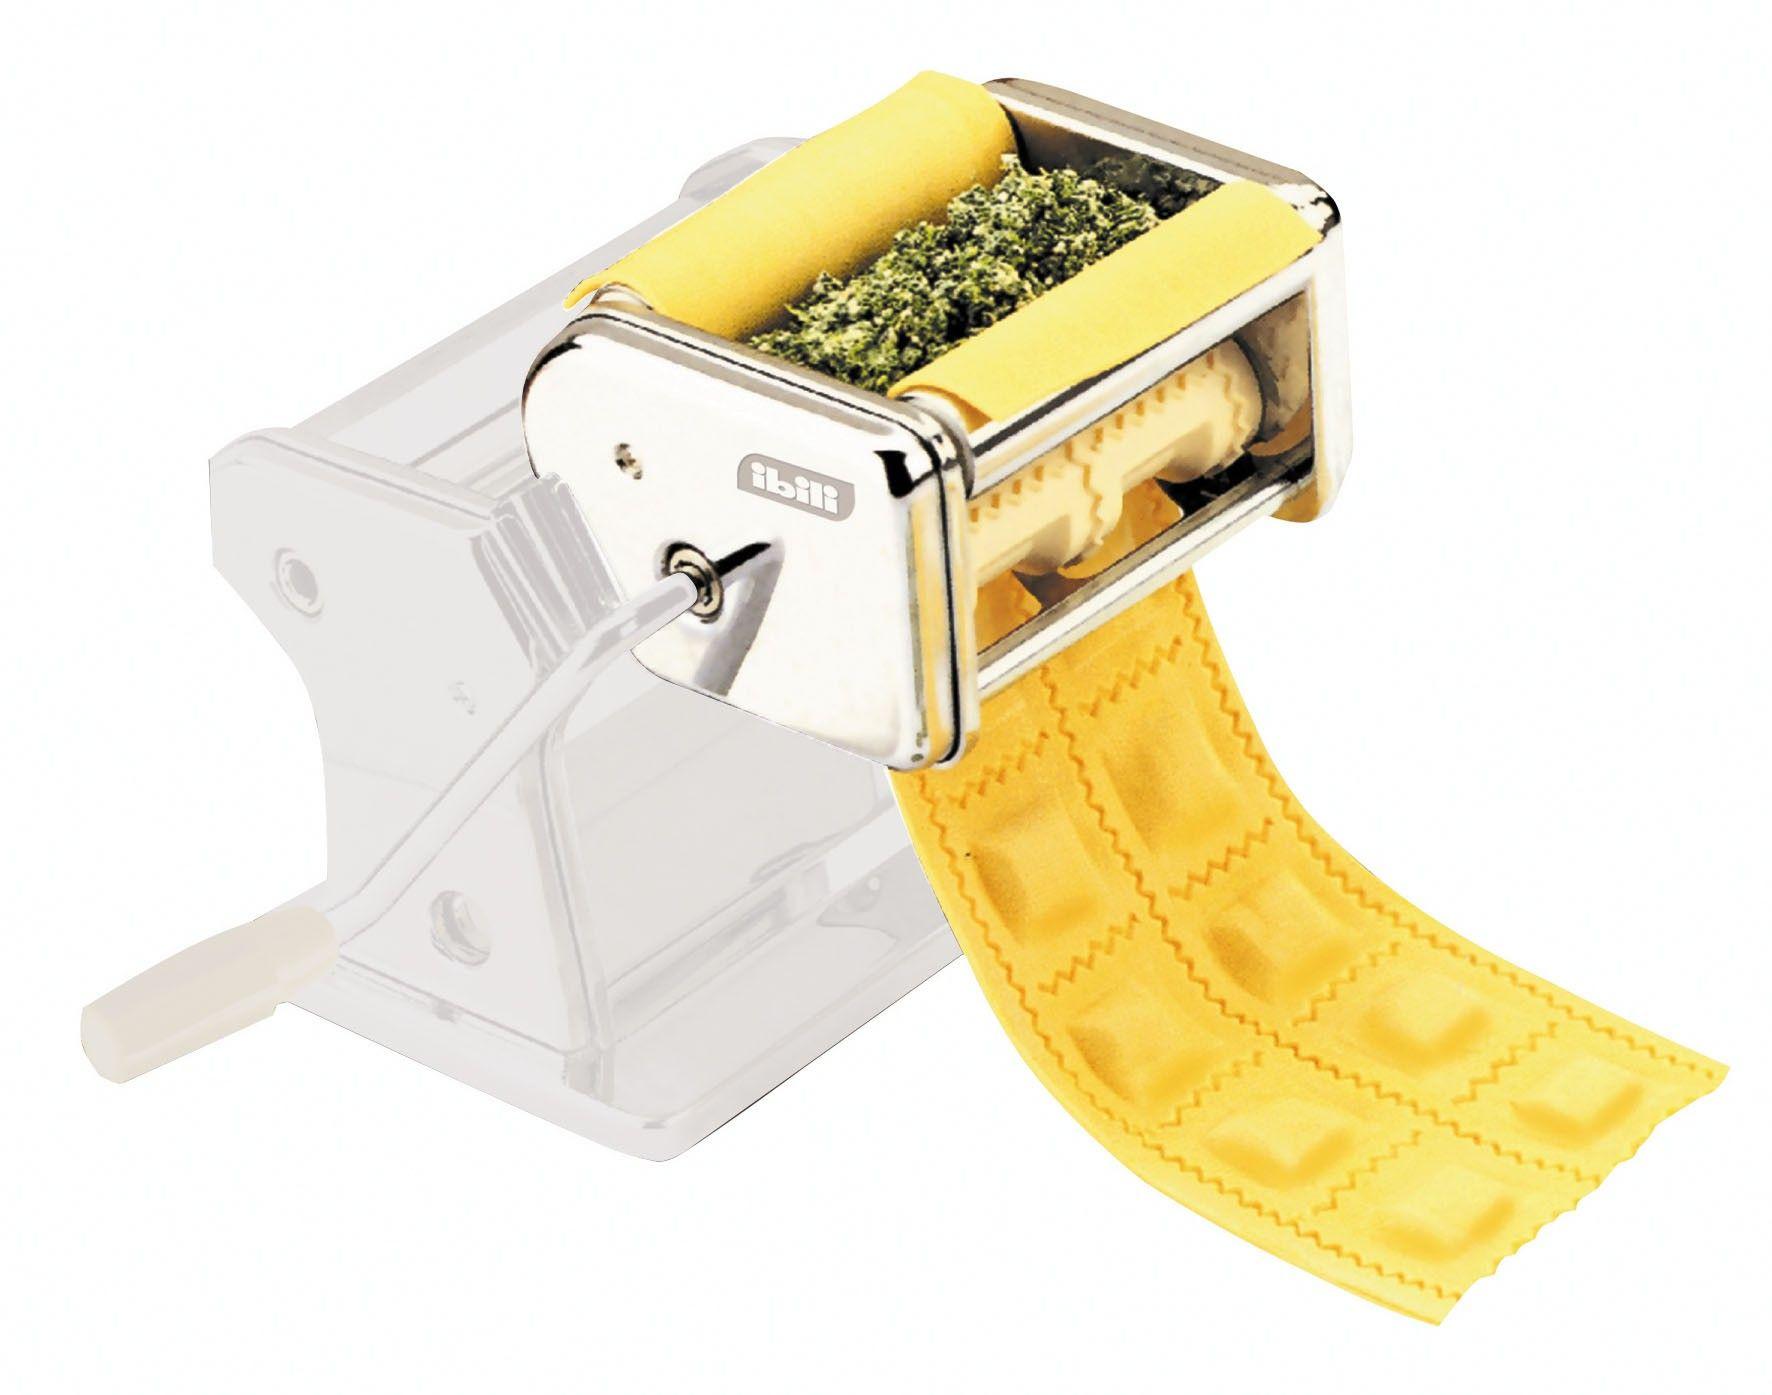 Utensilios para elaborar raviolis caseros utensilios for Productos de menaje